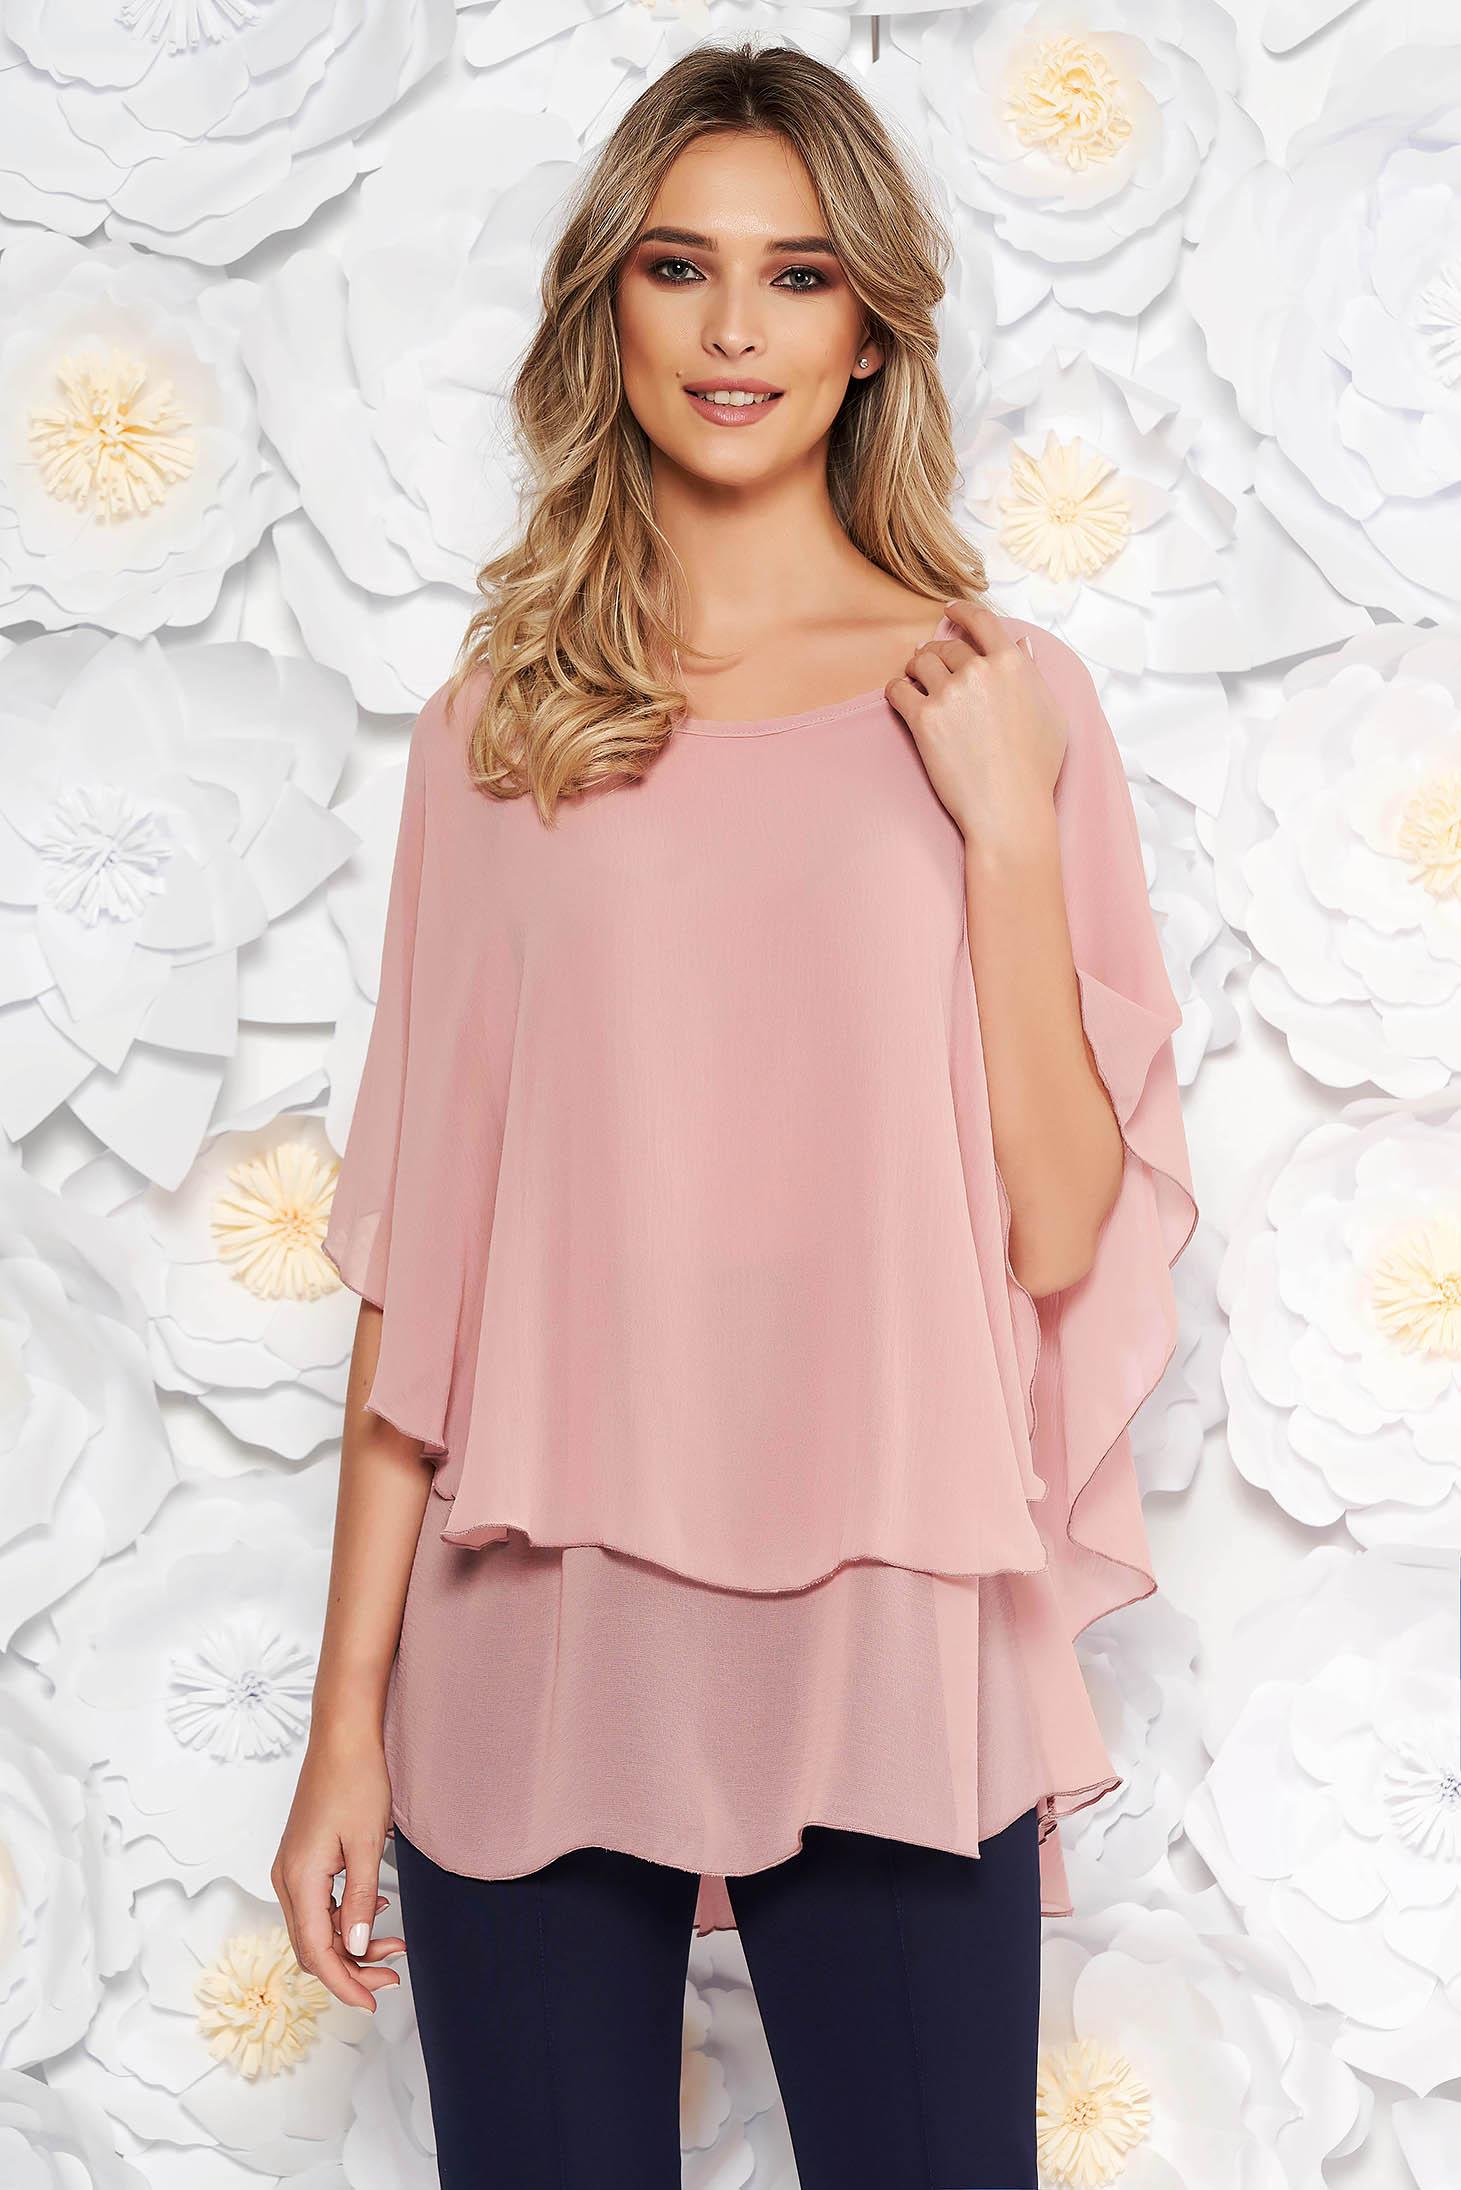 Bluza dama roz deschis eleganta asimetrica cu croi larg din voal